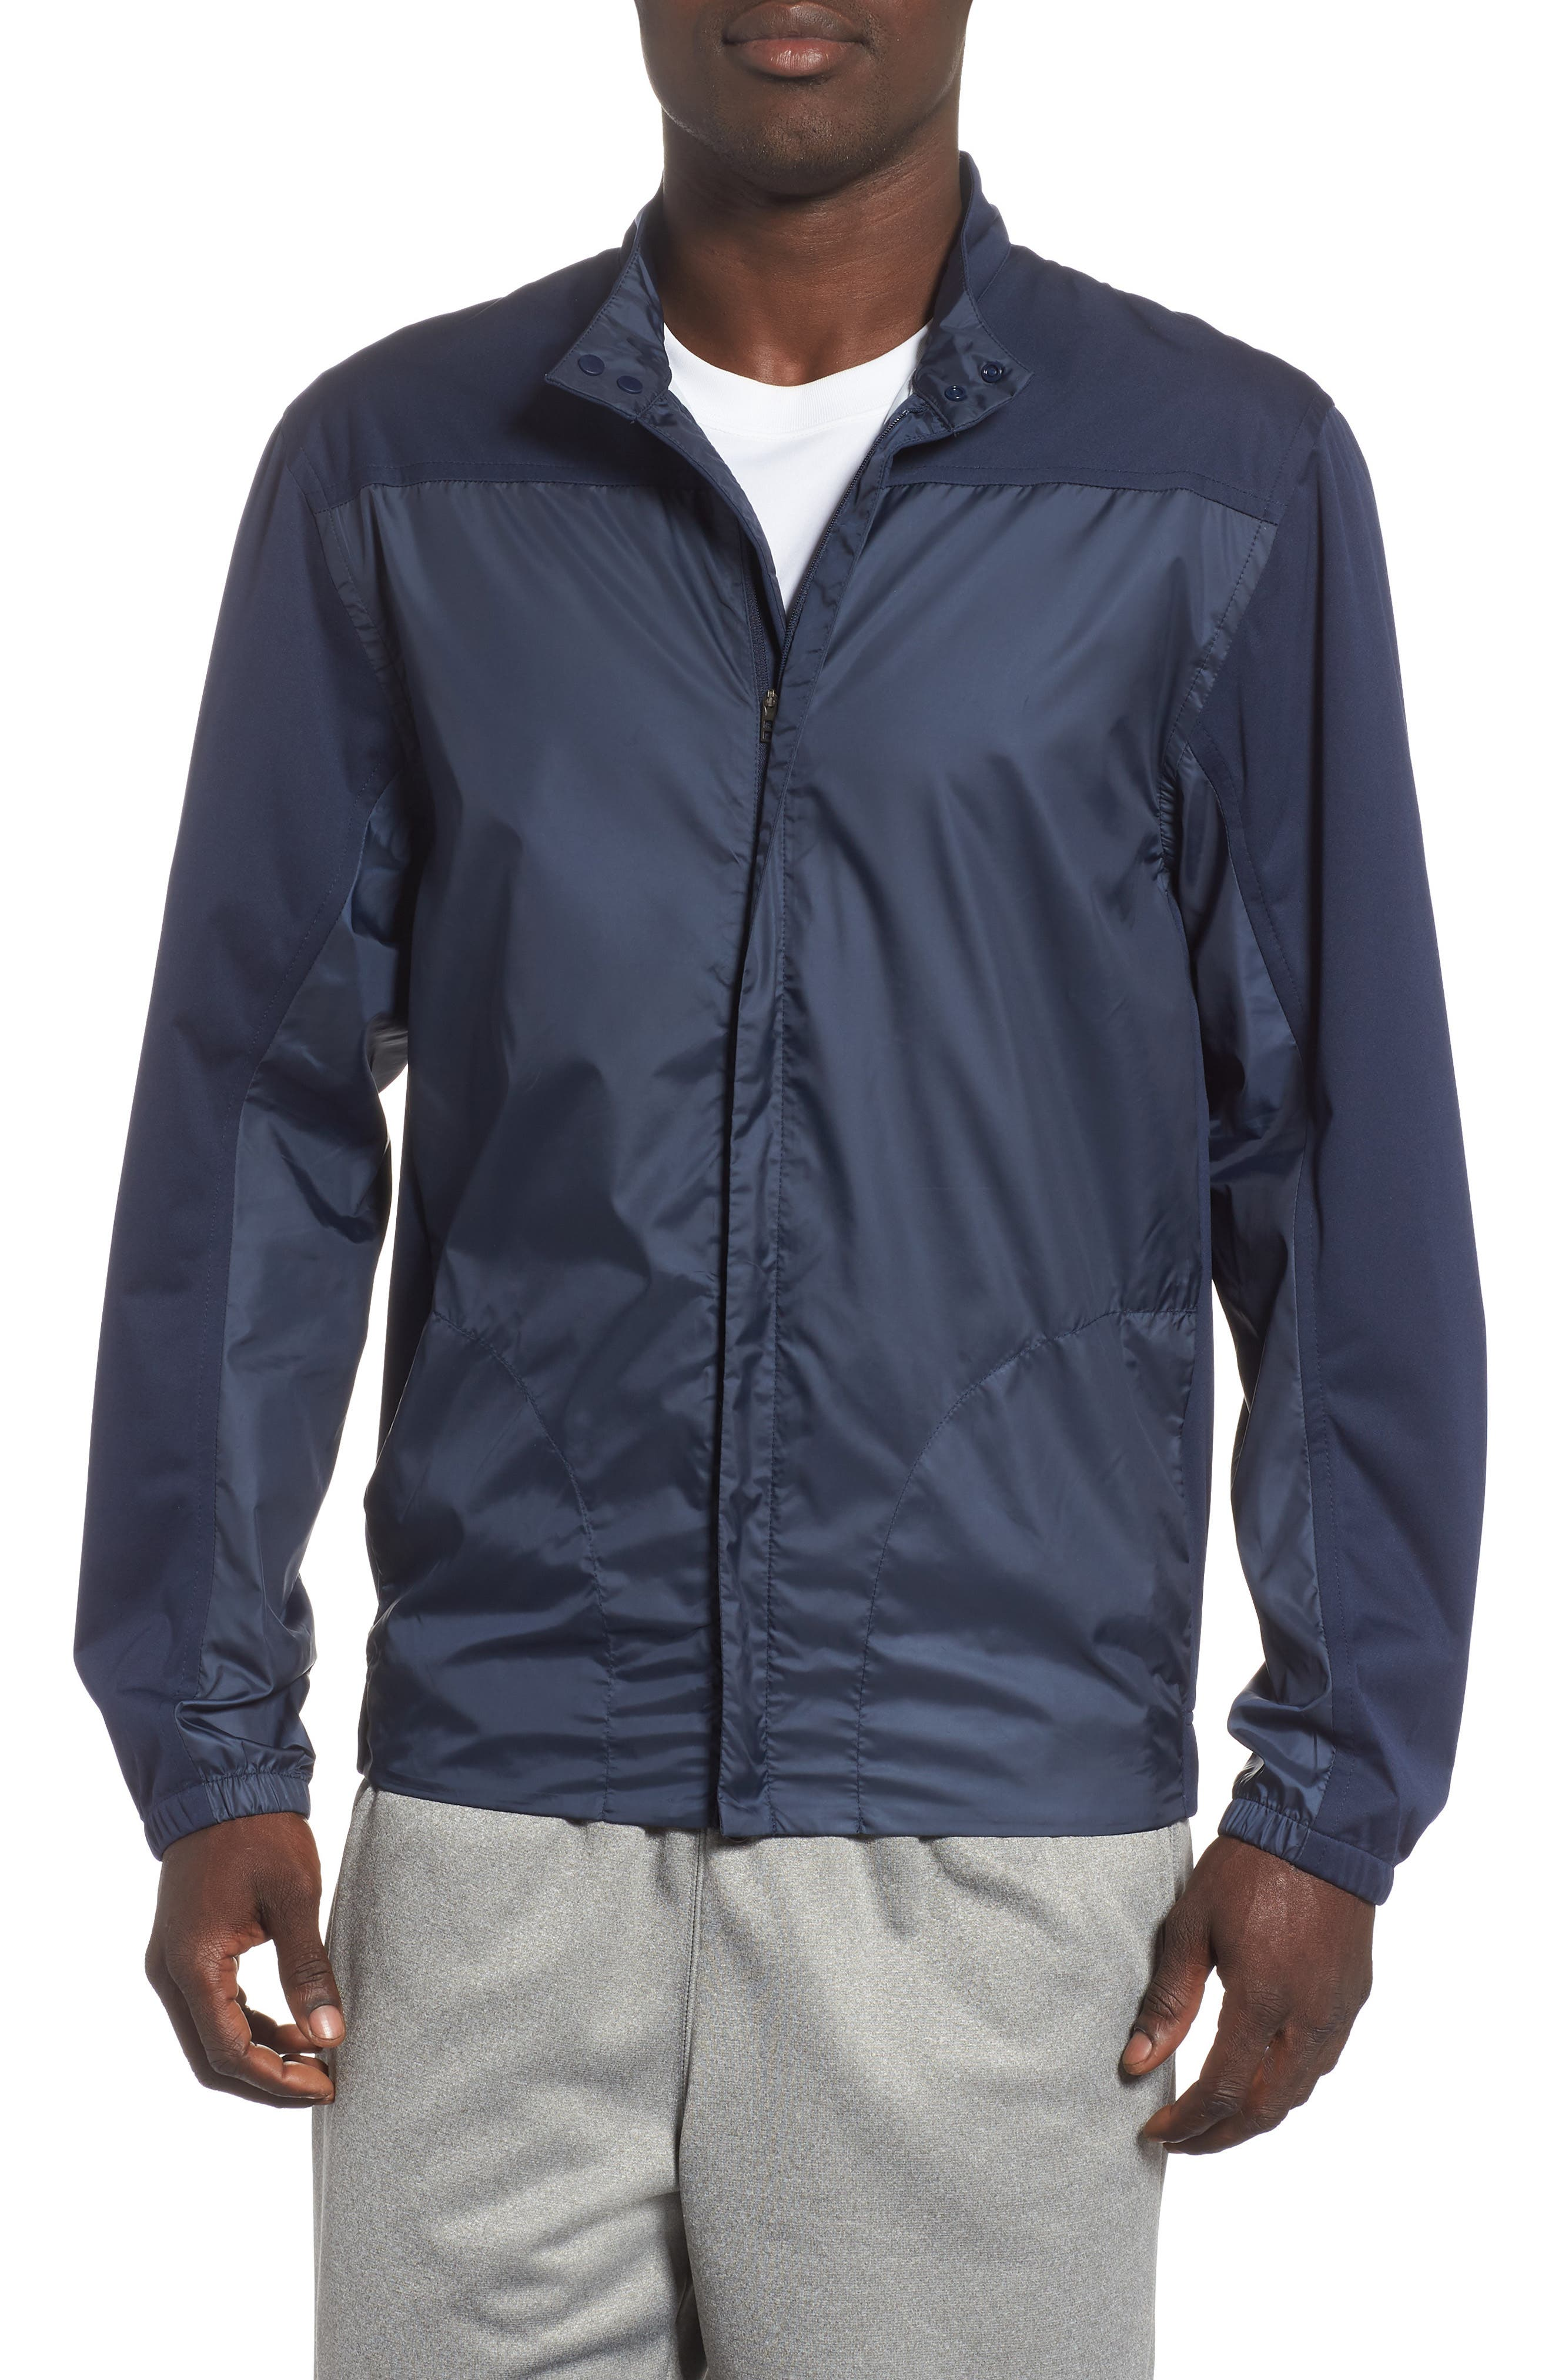 Shield Core Zip Golf Jacket,                             Main thumbnail 1, color,                             OBSIDIAN/ OBSIDIAN/ BLACK